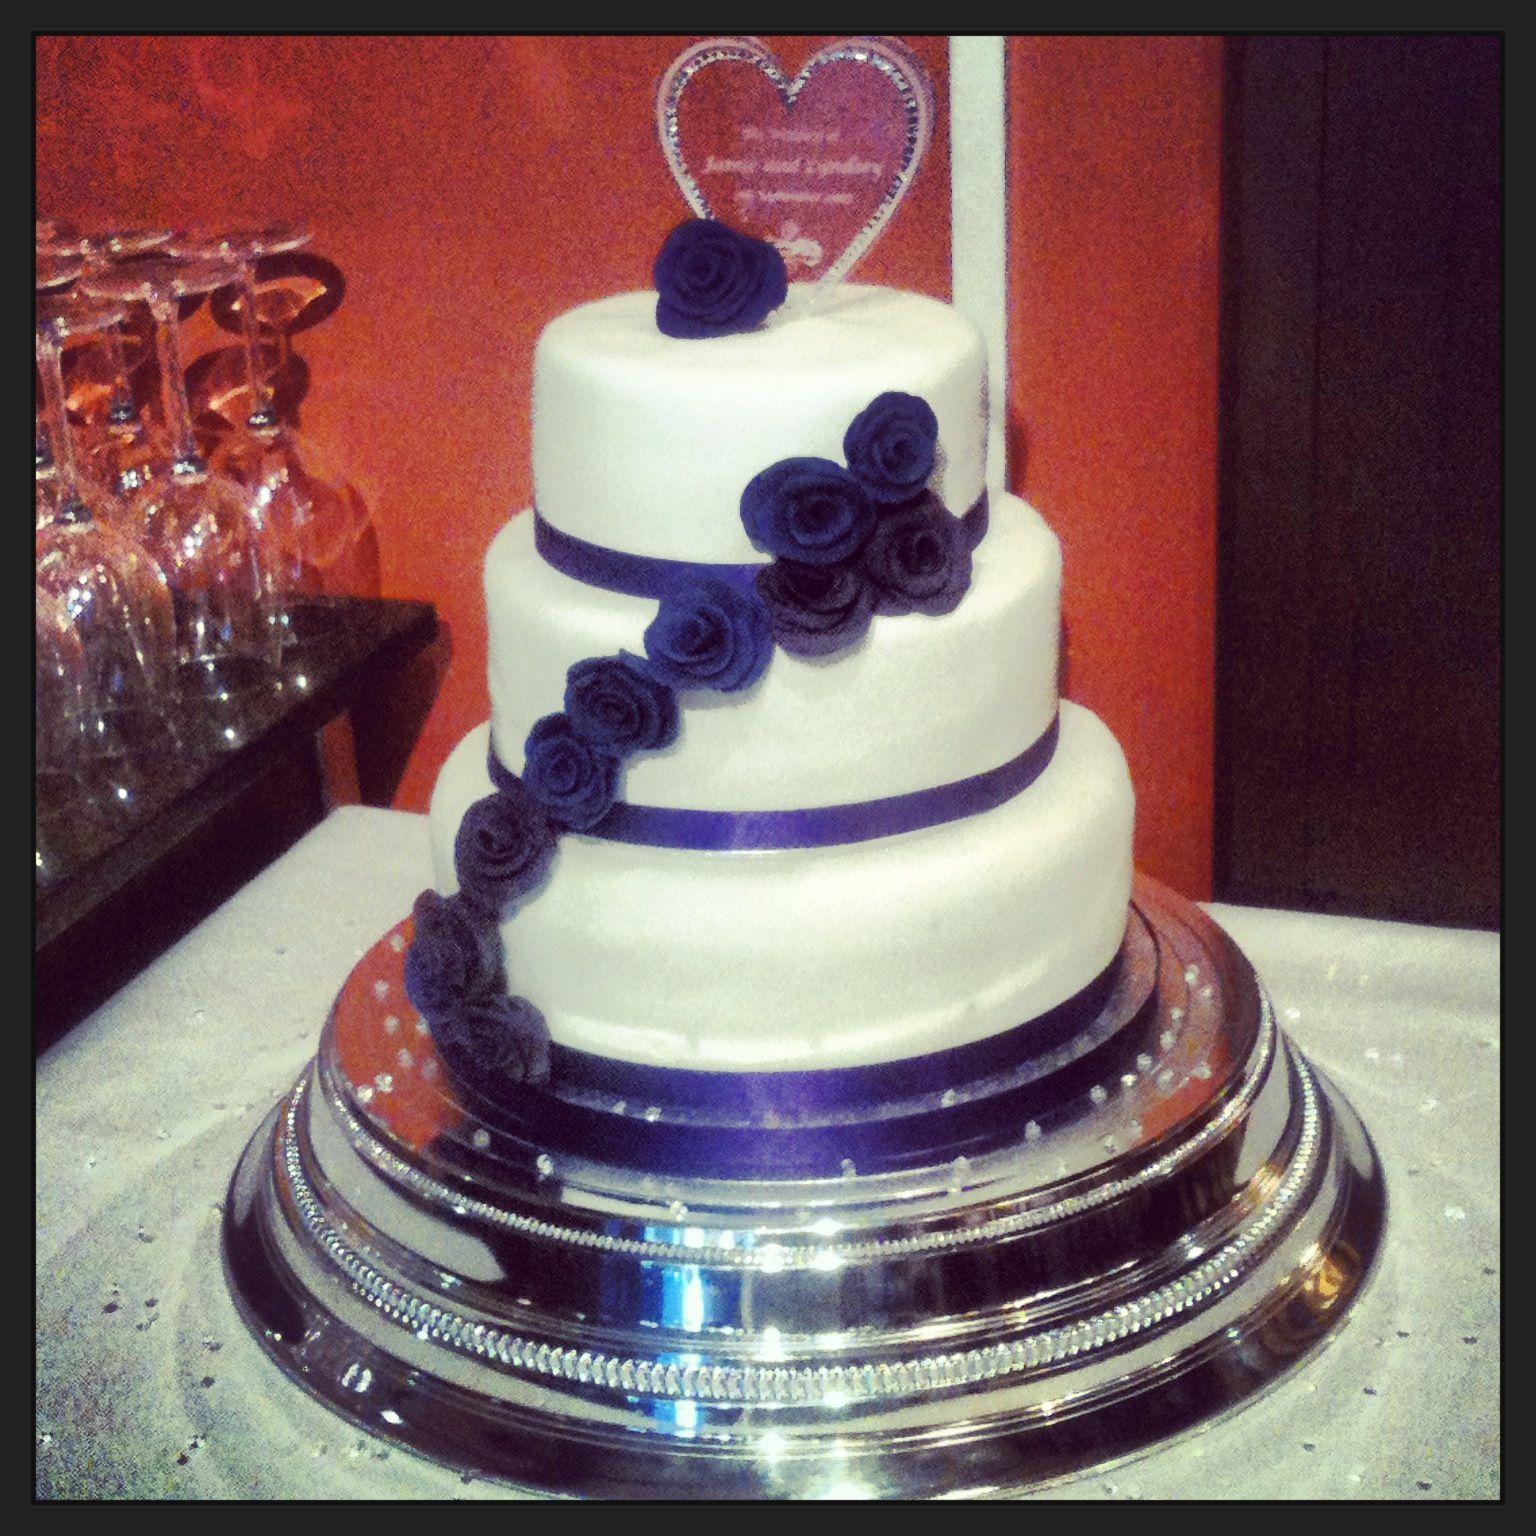 Pin Cadburys Purple Is Very Popular For Weddings This Year Wallpaper Cake On Pinterest